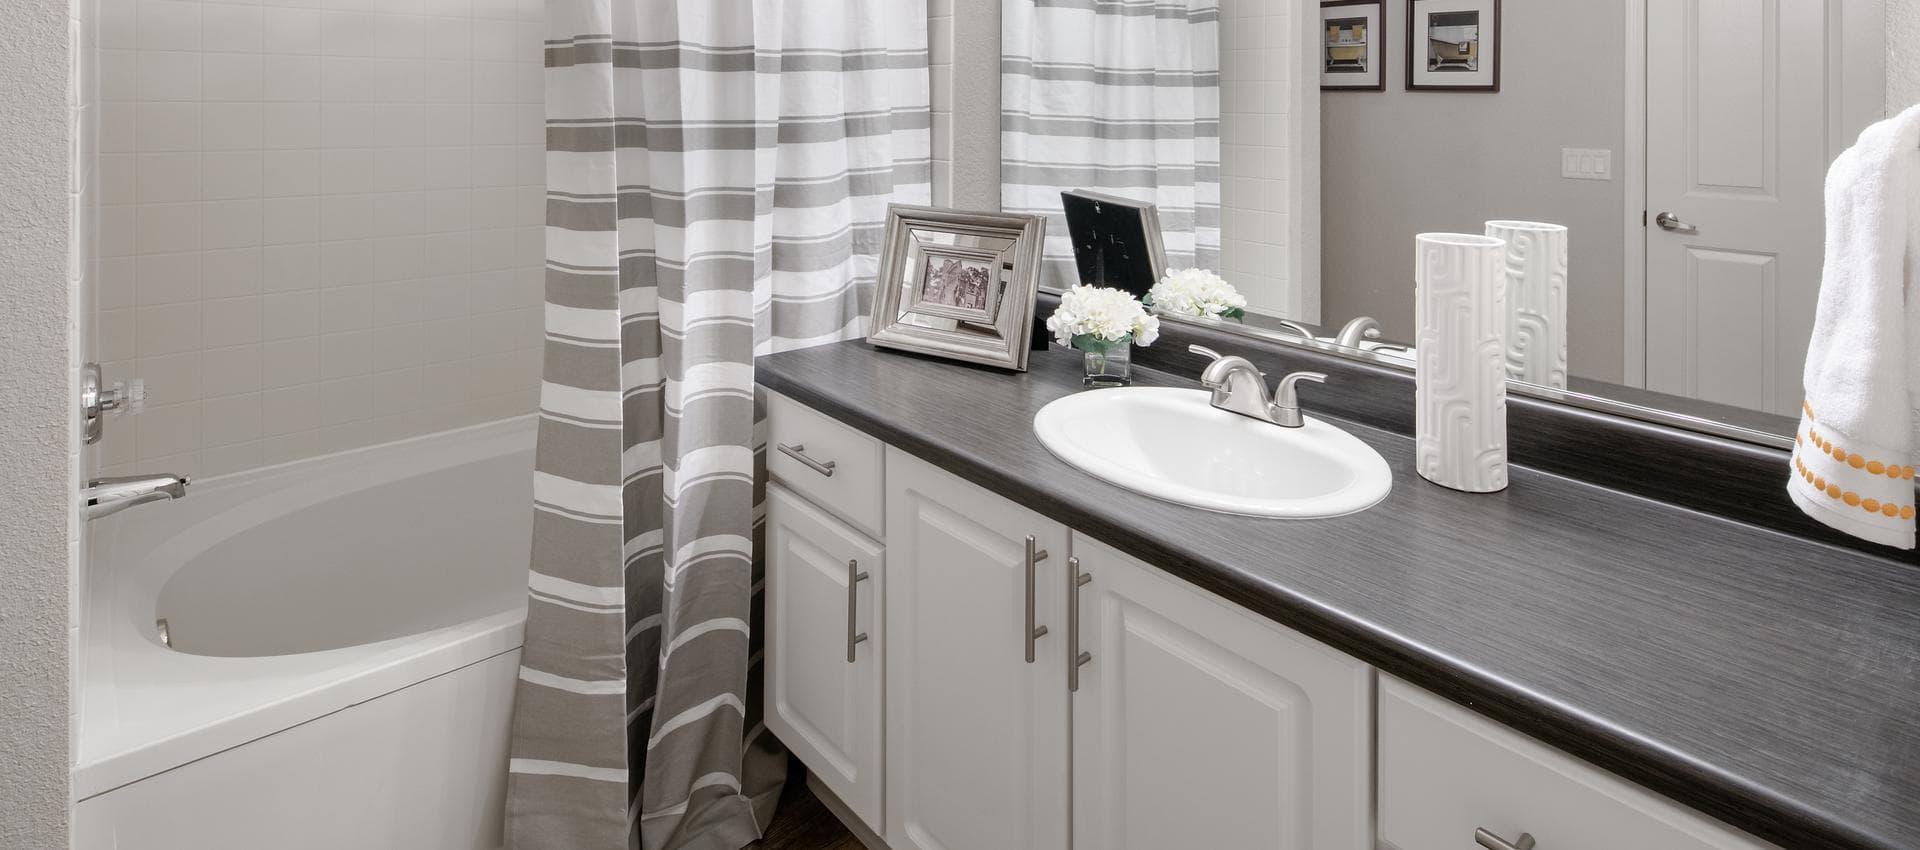 The Artisan Apartment Homes's Spacious Bathroom in Sacramento, CA